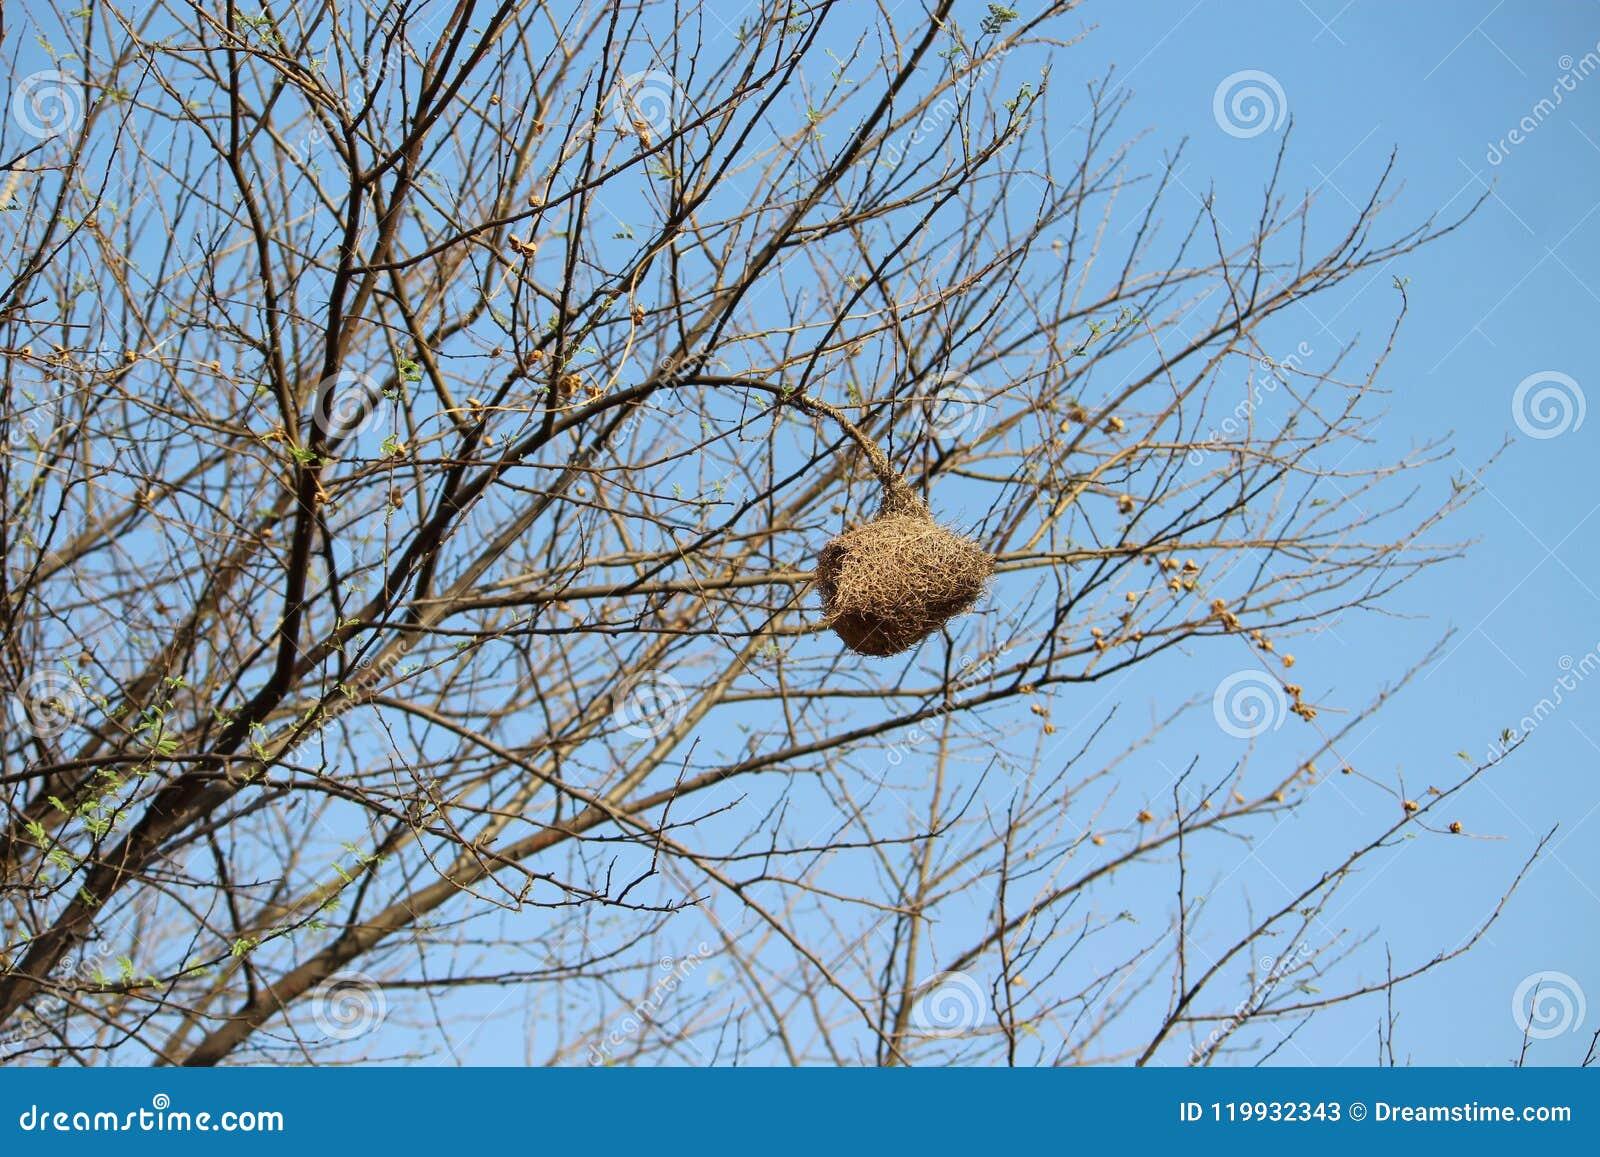 Marathi Name Sugaran Home Or Nest Stock Image Image Of Sugaran Name 119932343